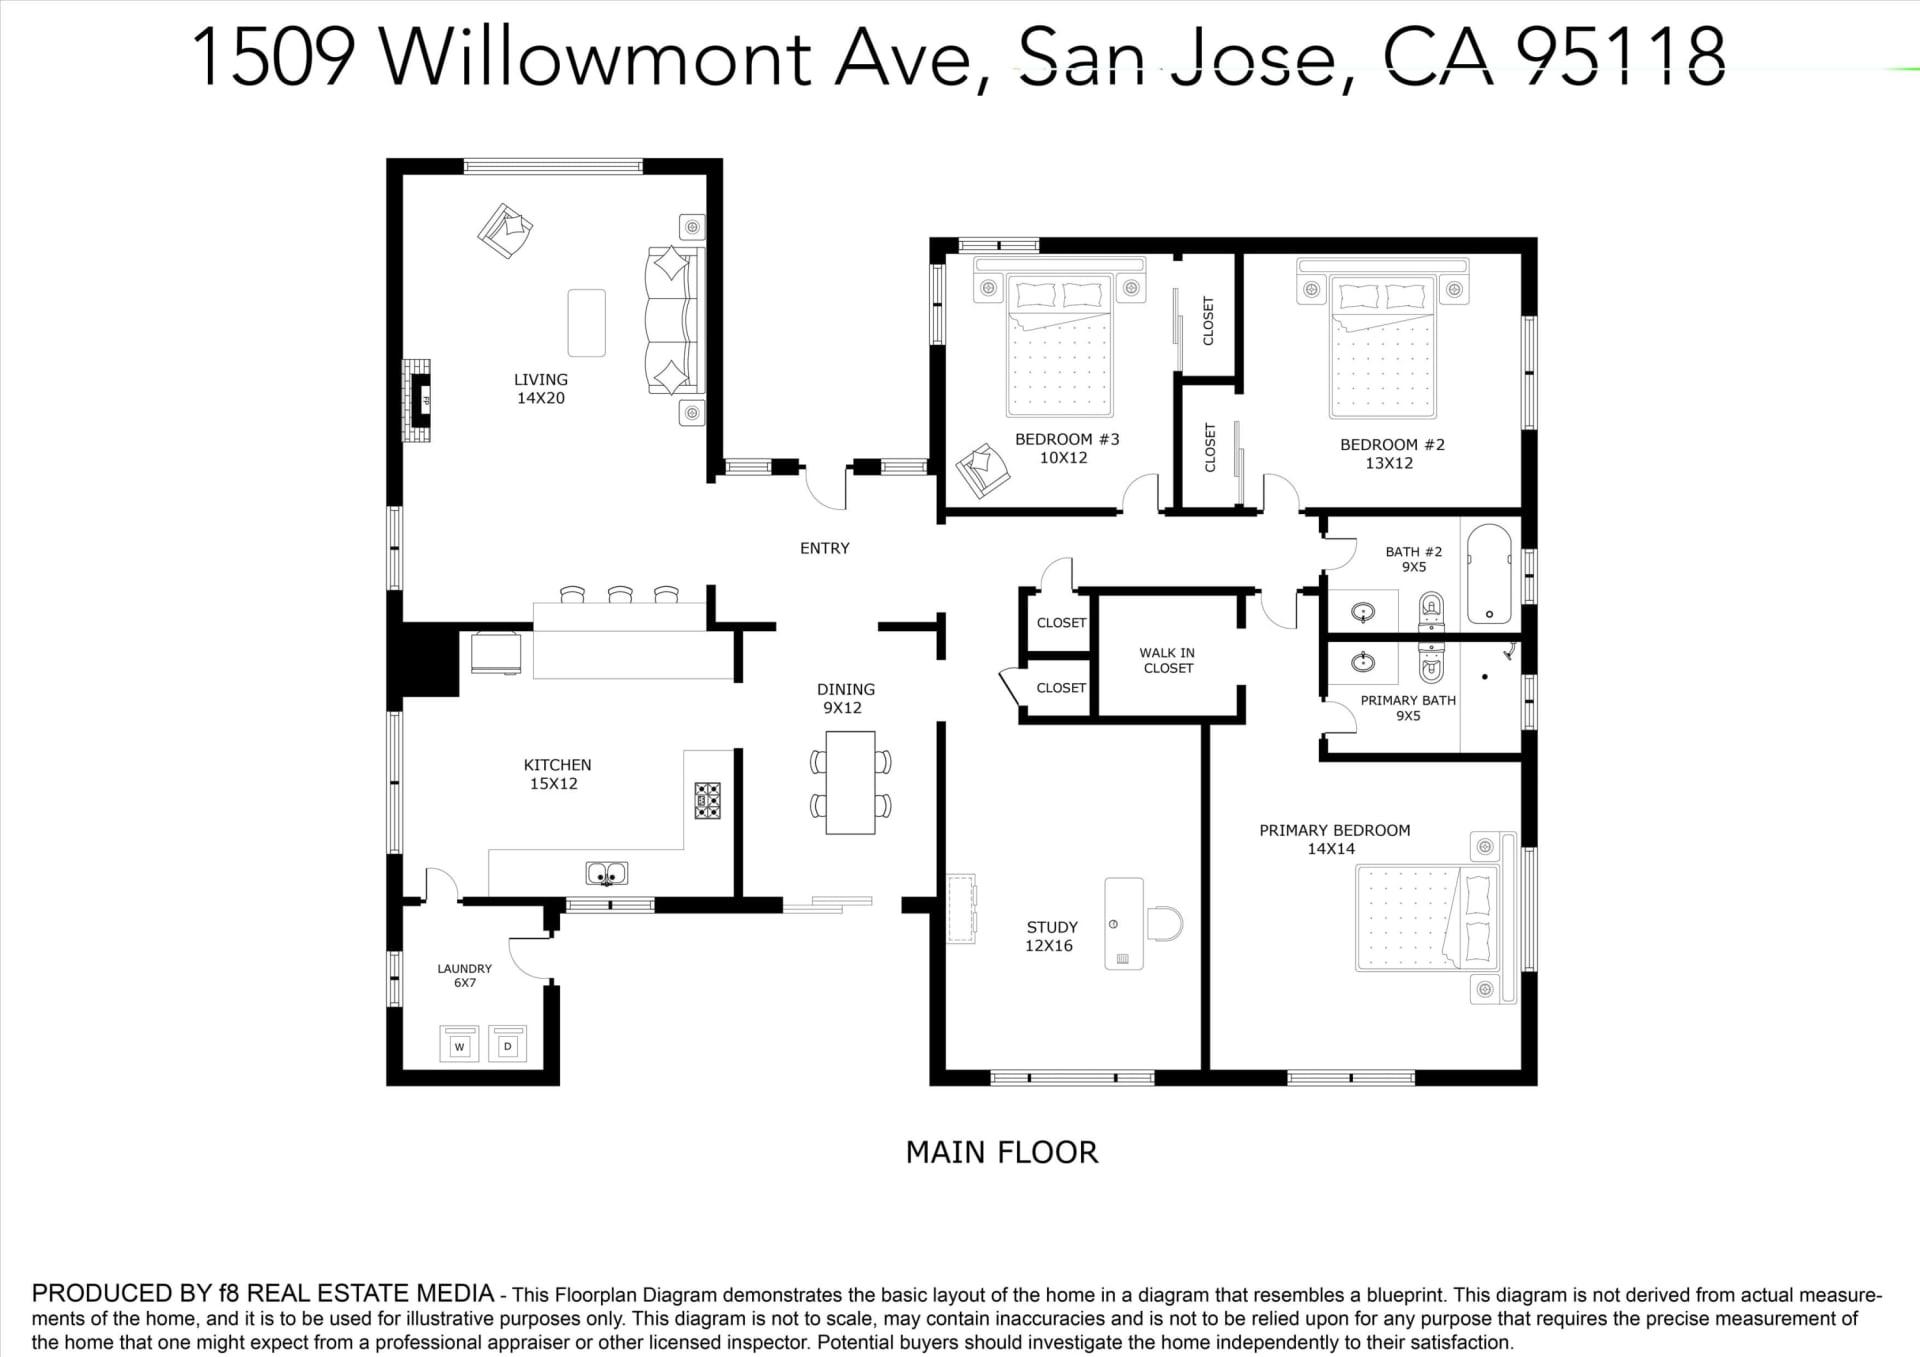 1509 Willowmont Ave photo